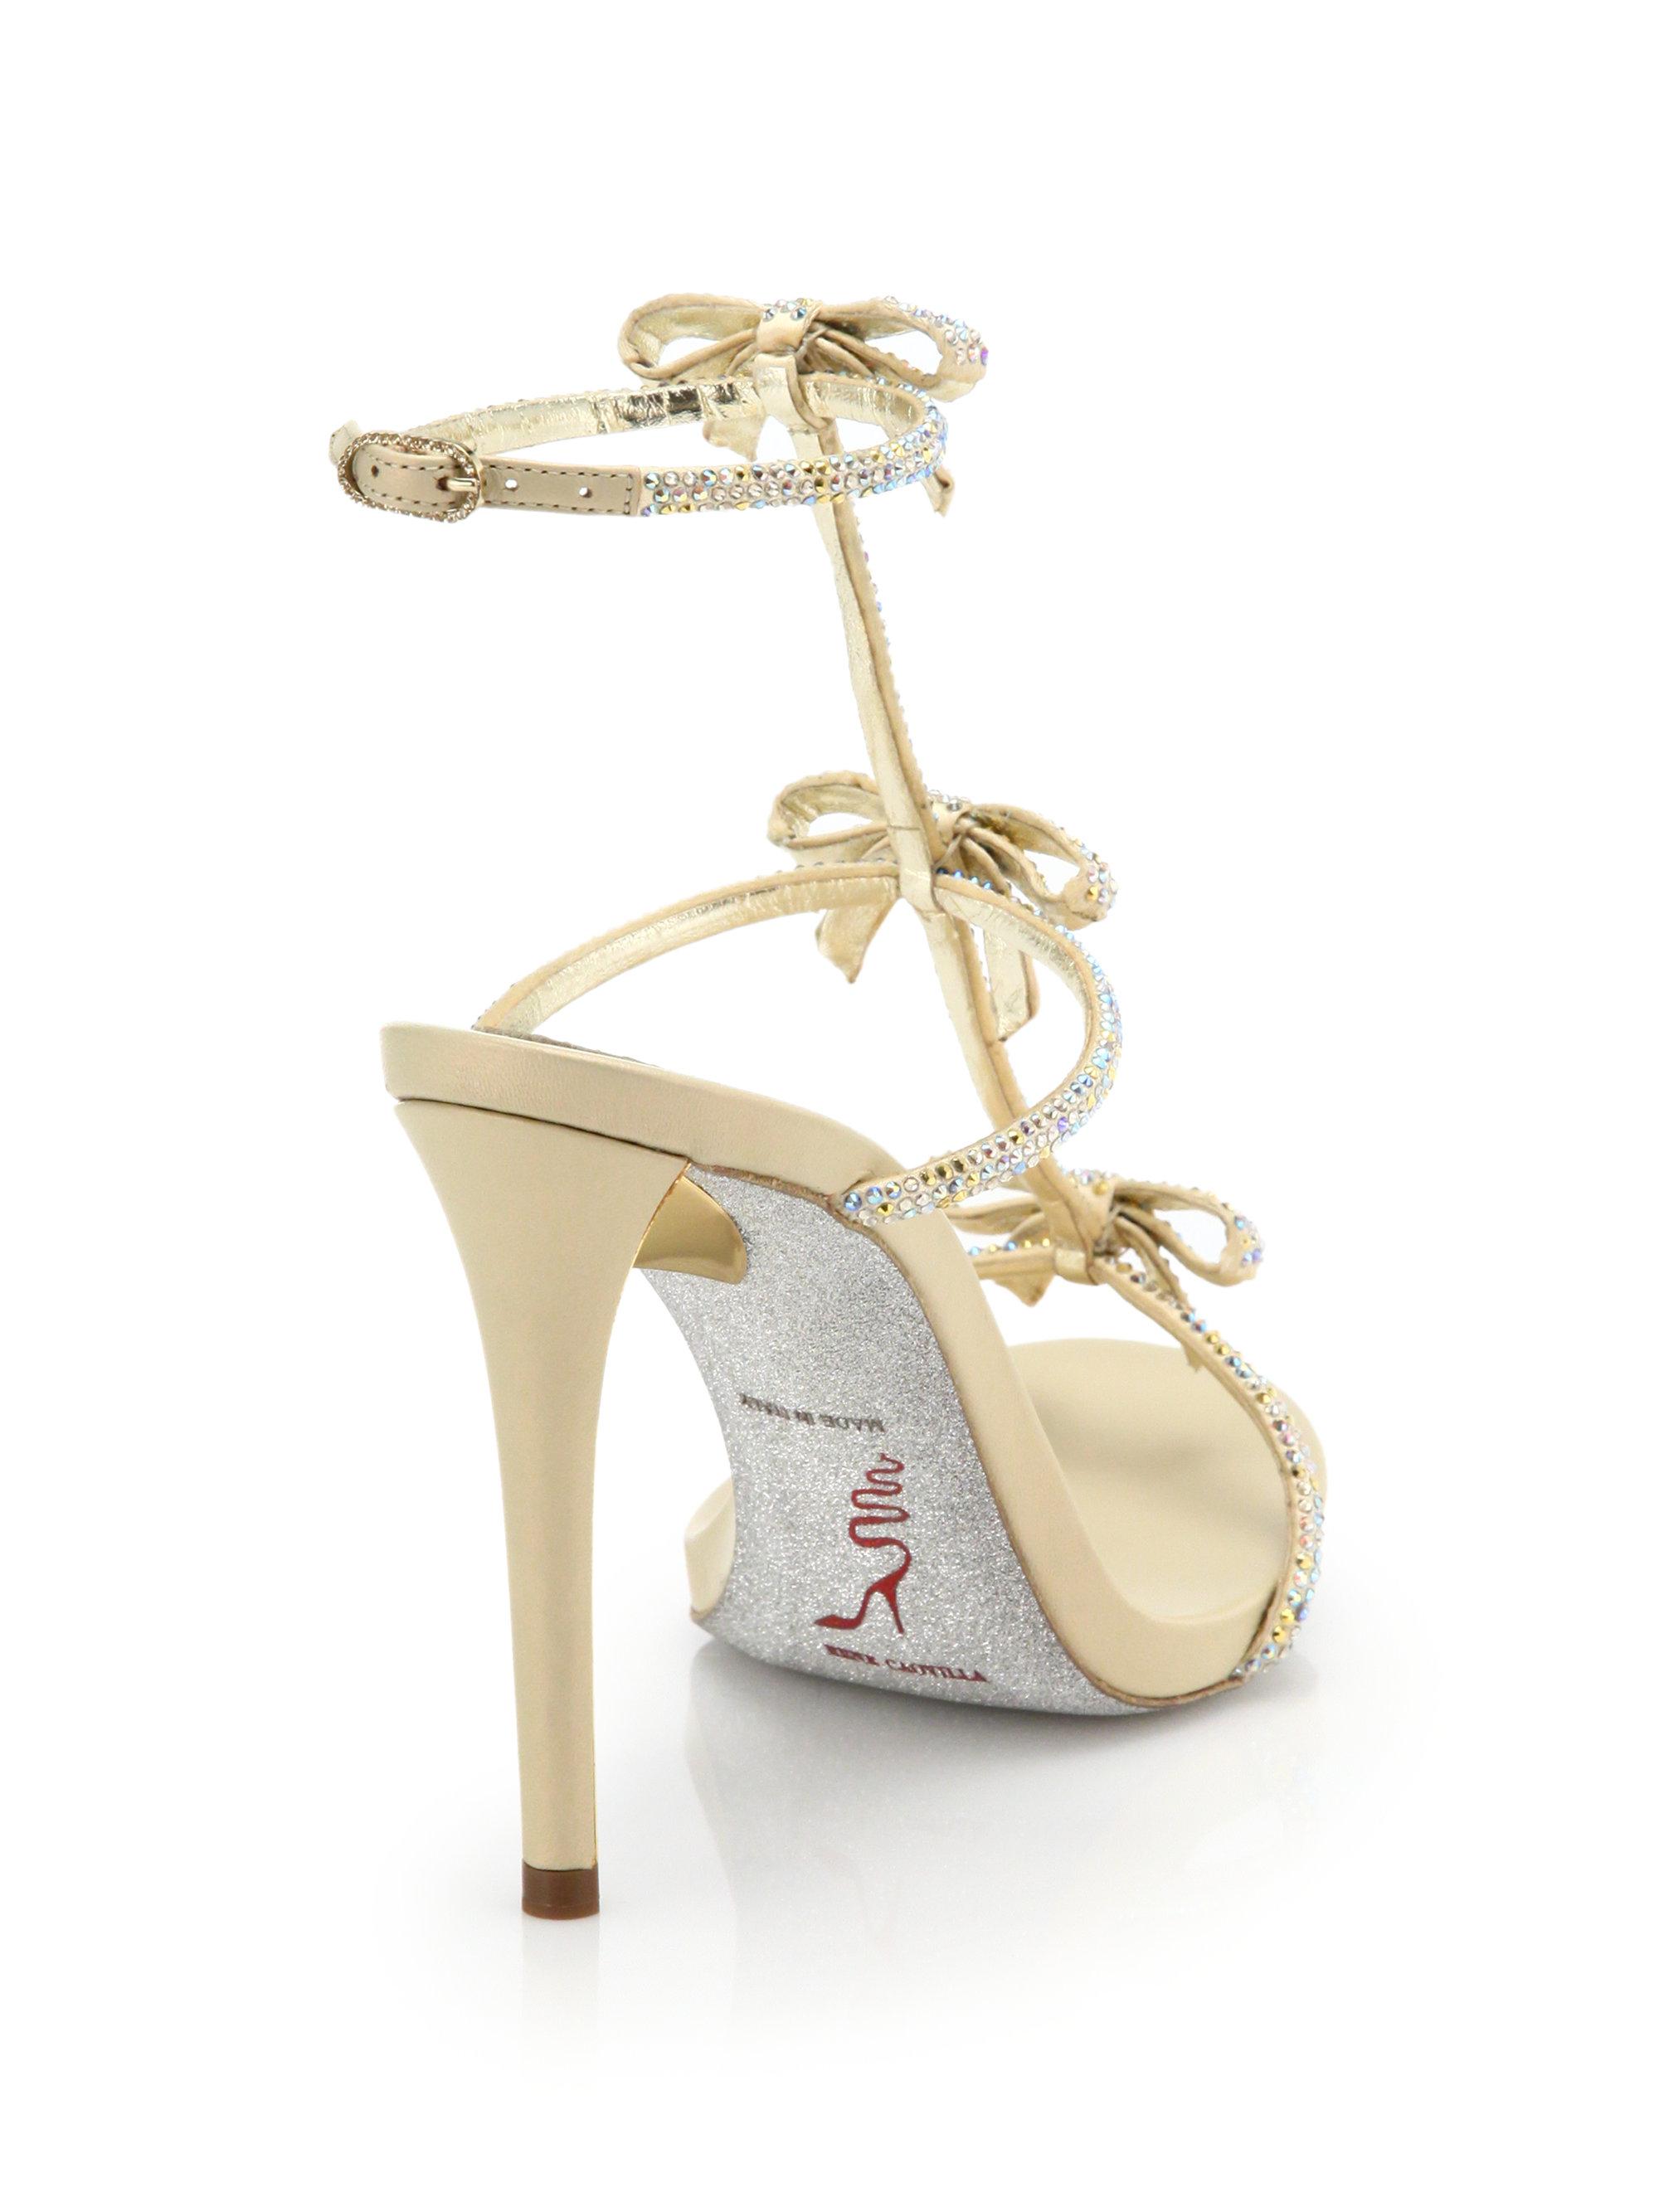 f1b40e750 Lyst - Rene Caovilla Strass Swarovski Crystal Bow Sandals in Metallic